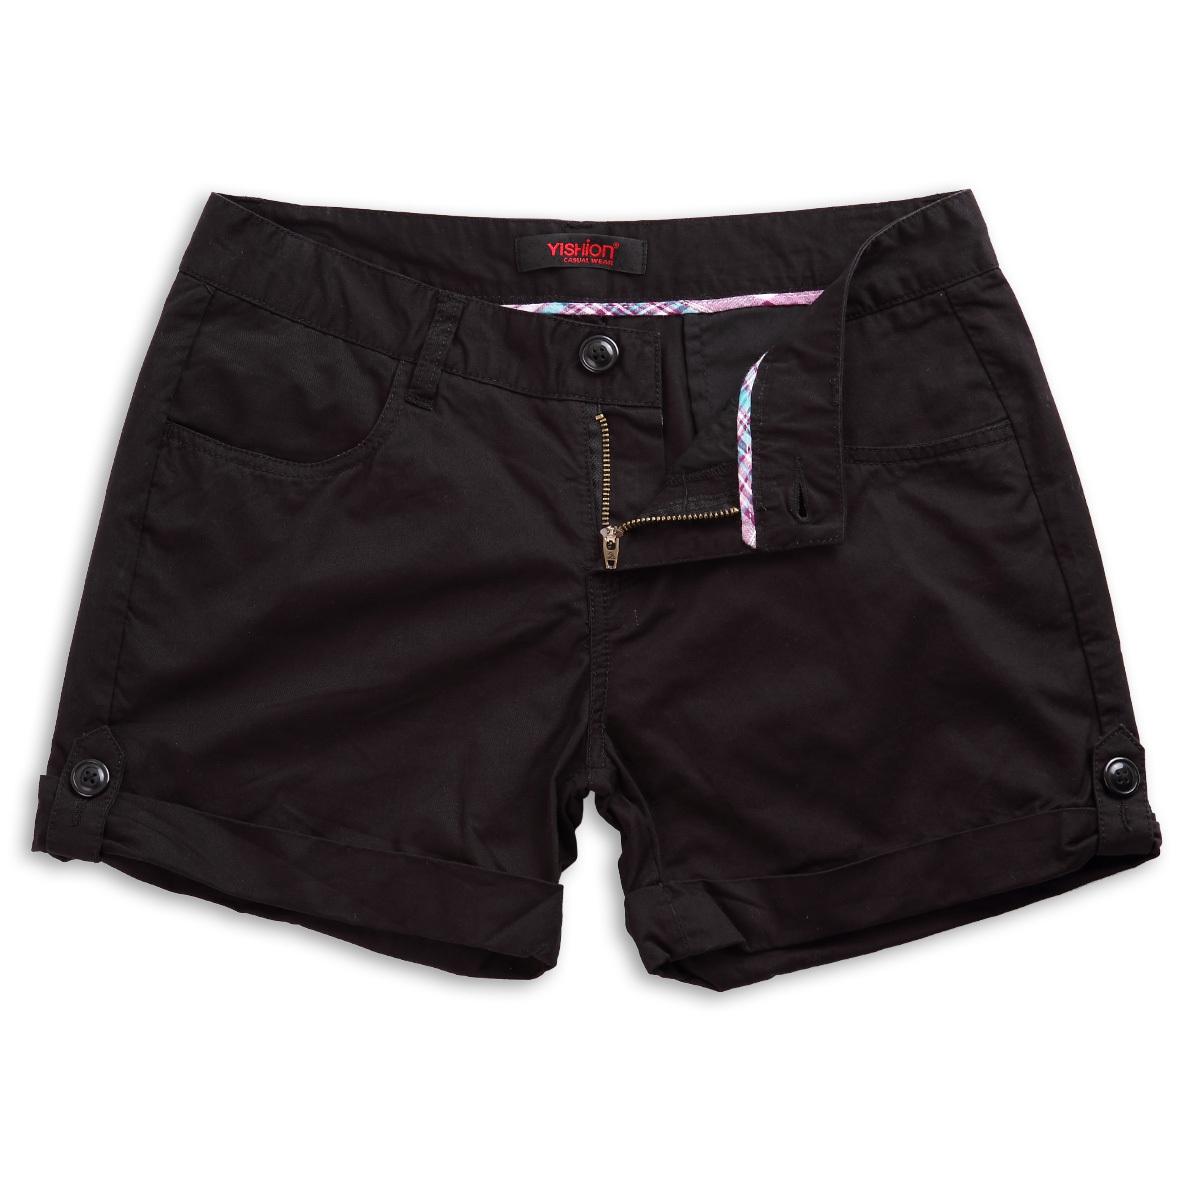 Женские брюки Yishion 10220537 89 Шорты, мини-шорты Прямые